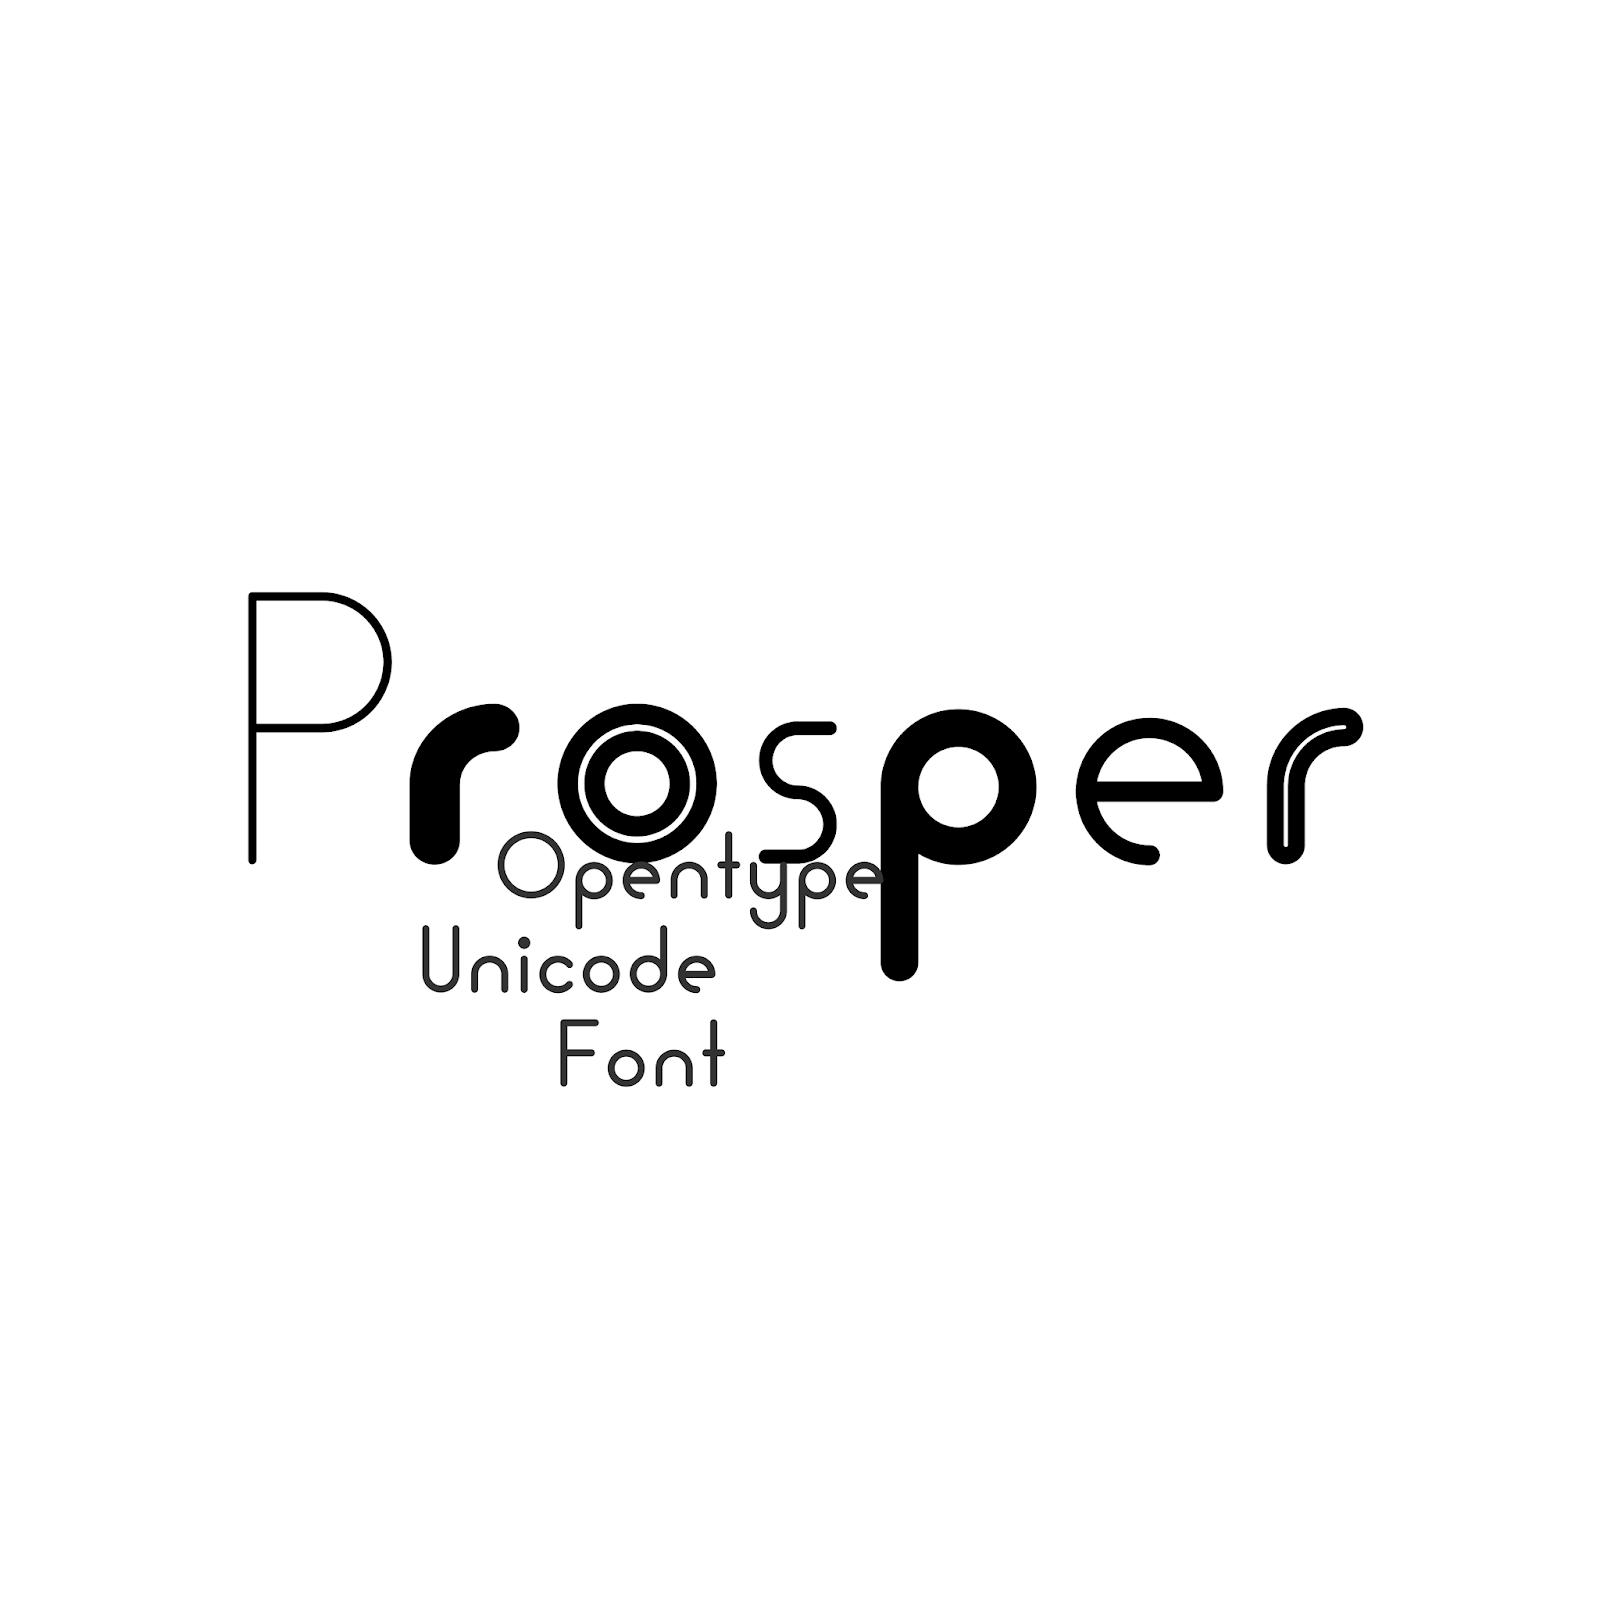 PVF_Prosper #Free Style Rounded Geometric Sans-Serif Font